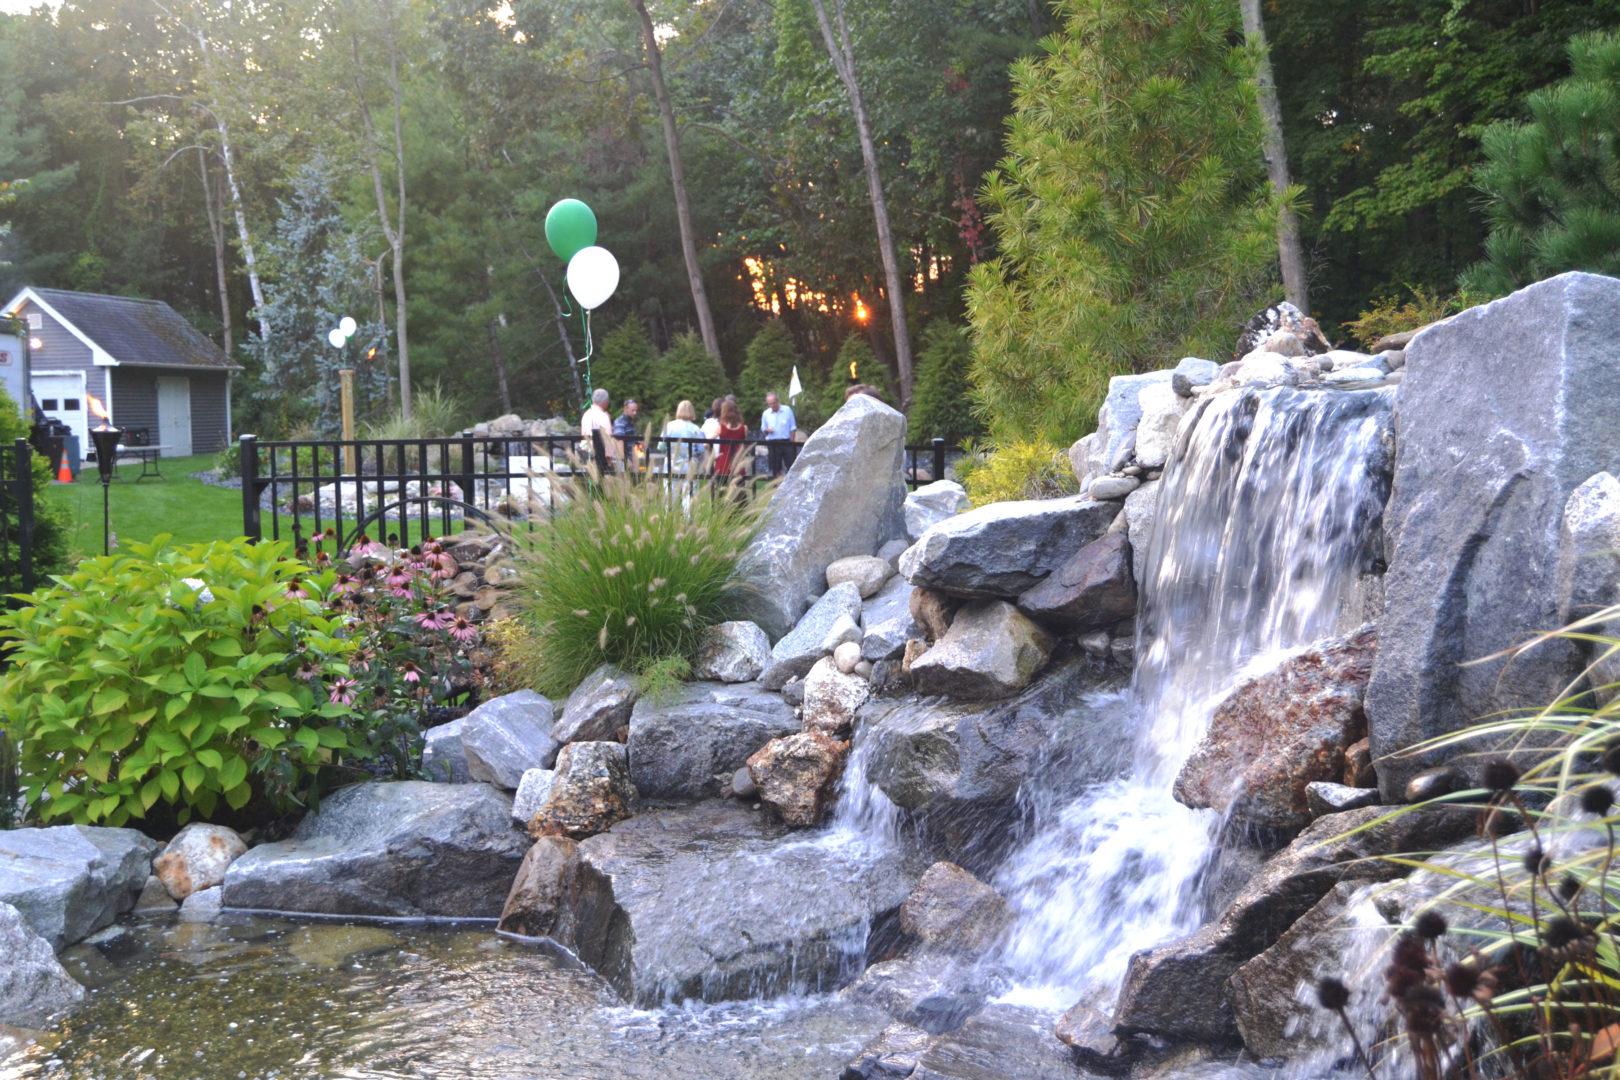 Aquascape_Waterfall_PuttingGreen-1620x1080.jpg